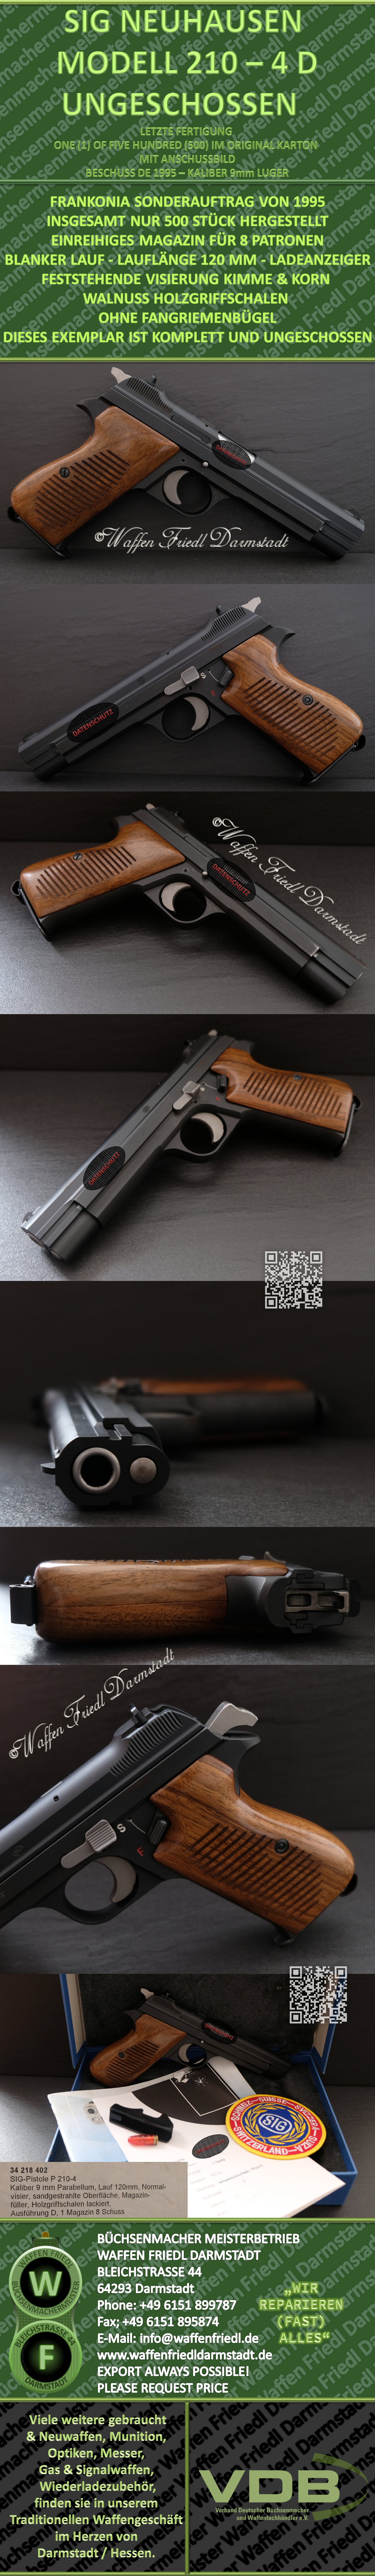 SIG 210-4 SONDERSERIE D - KALIBER 9mm LUGER - UNGESCHOSSENER GESAMTZUSTAND - LETZTE FERTIGUNG SIG NEUHAUSEN